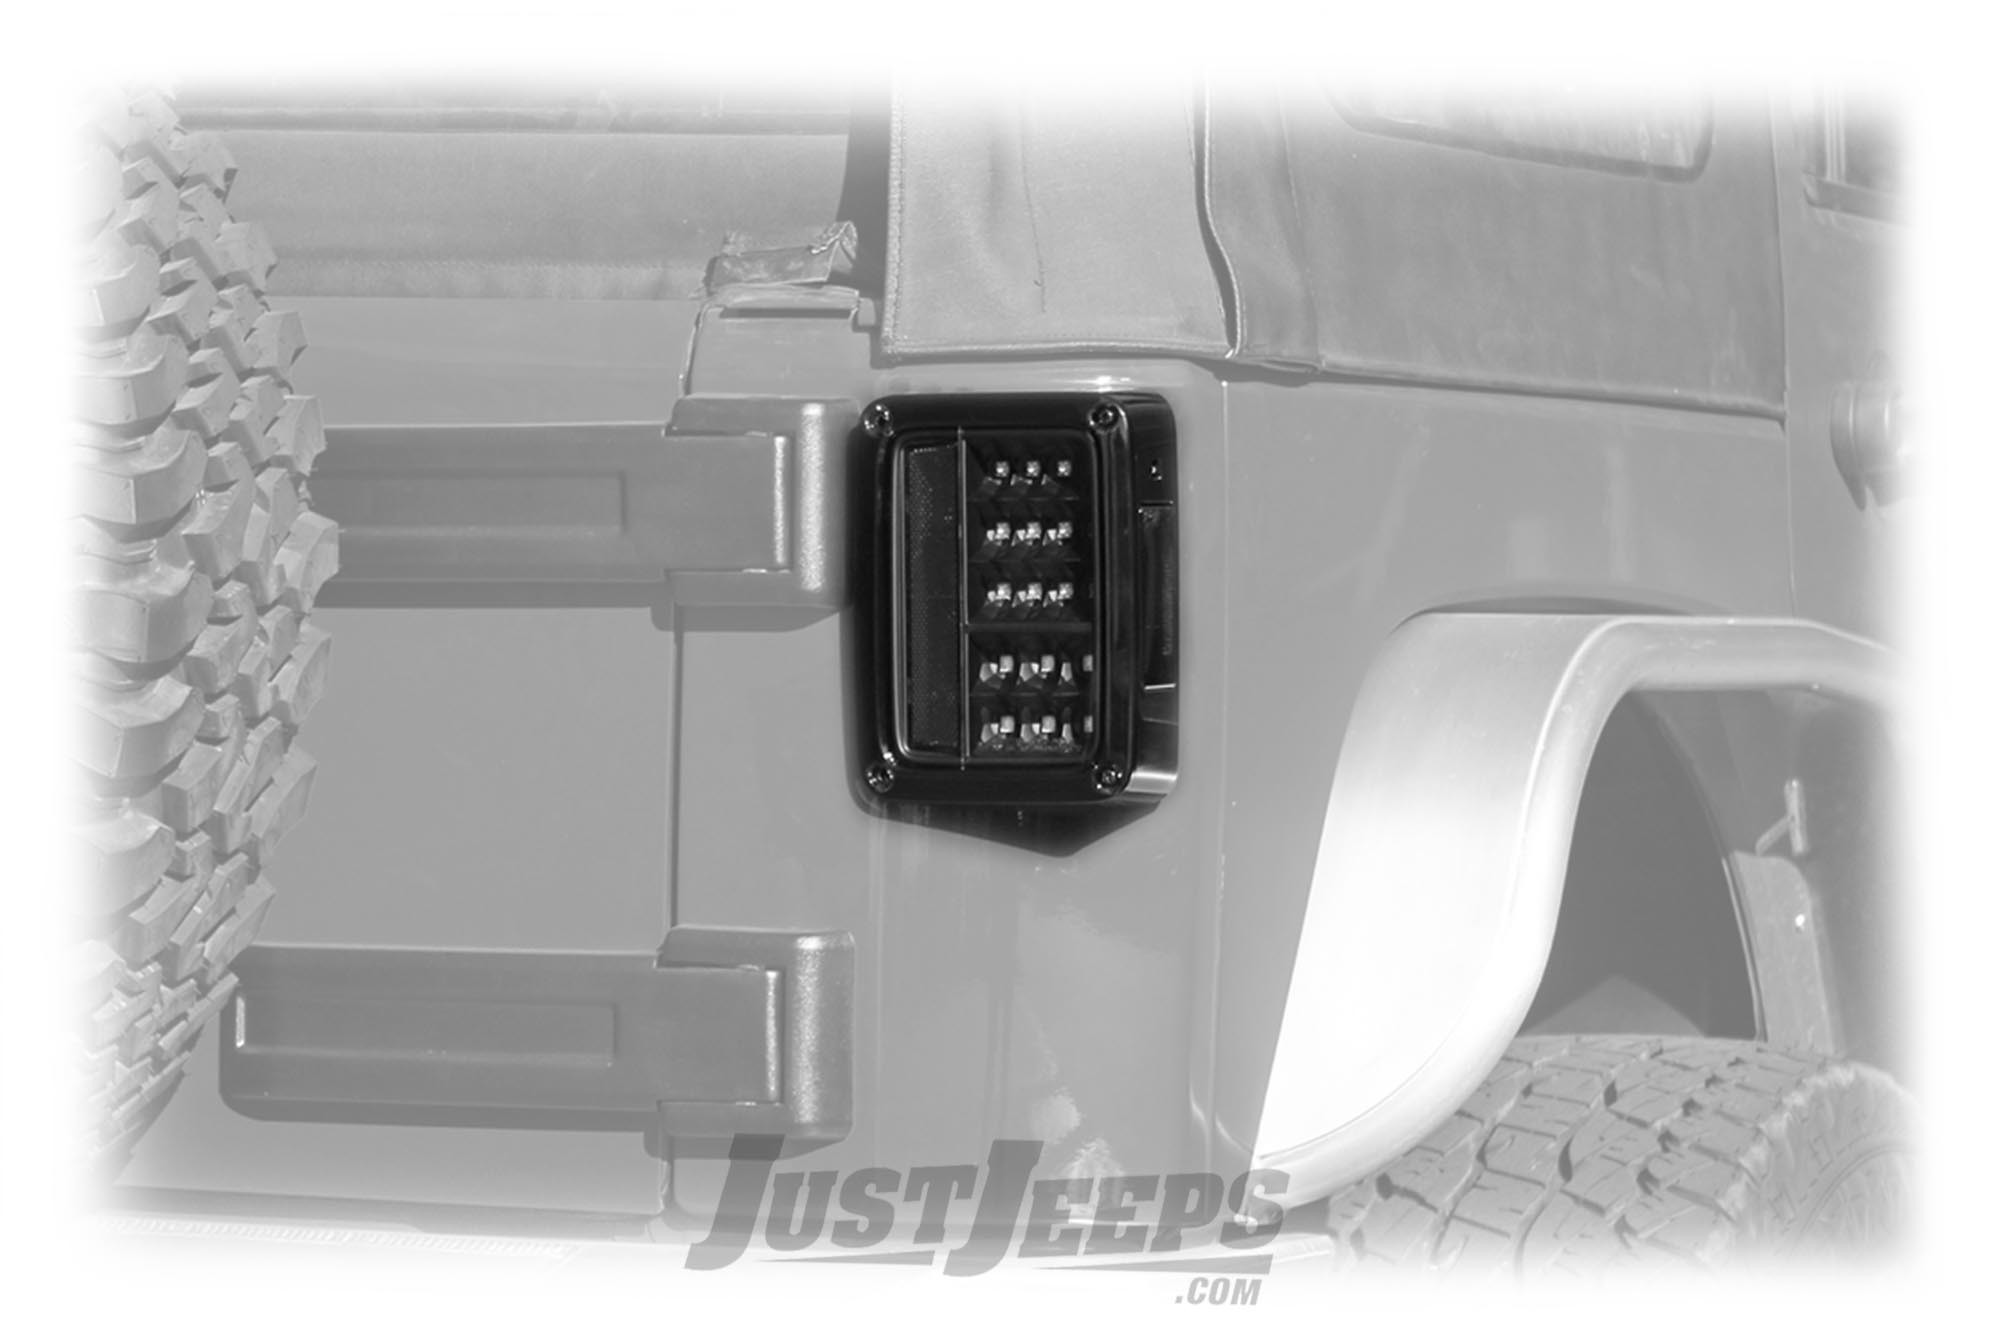 Spyder Automotive LED Tail Lights (Pair) For 2007-18 Jeep Wrangler 2 Door & Unlimited 4 Door Models 5070395-